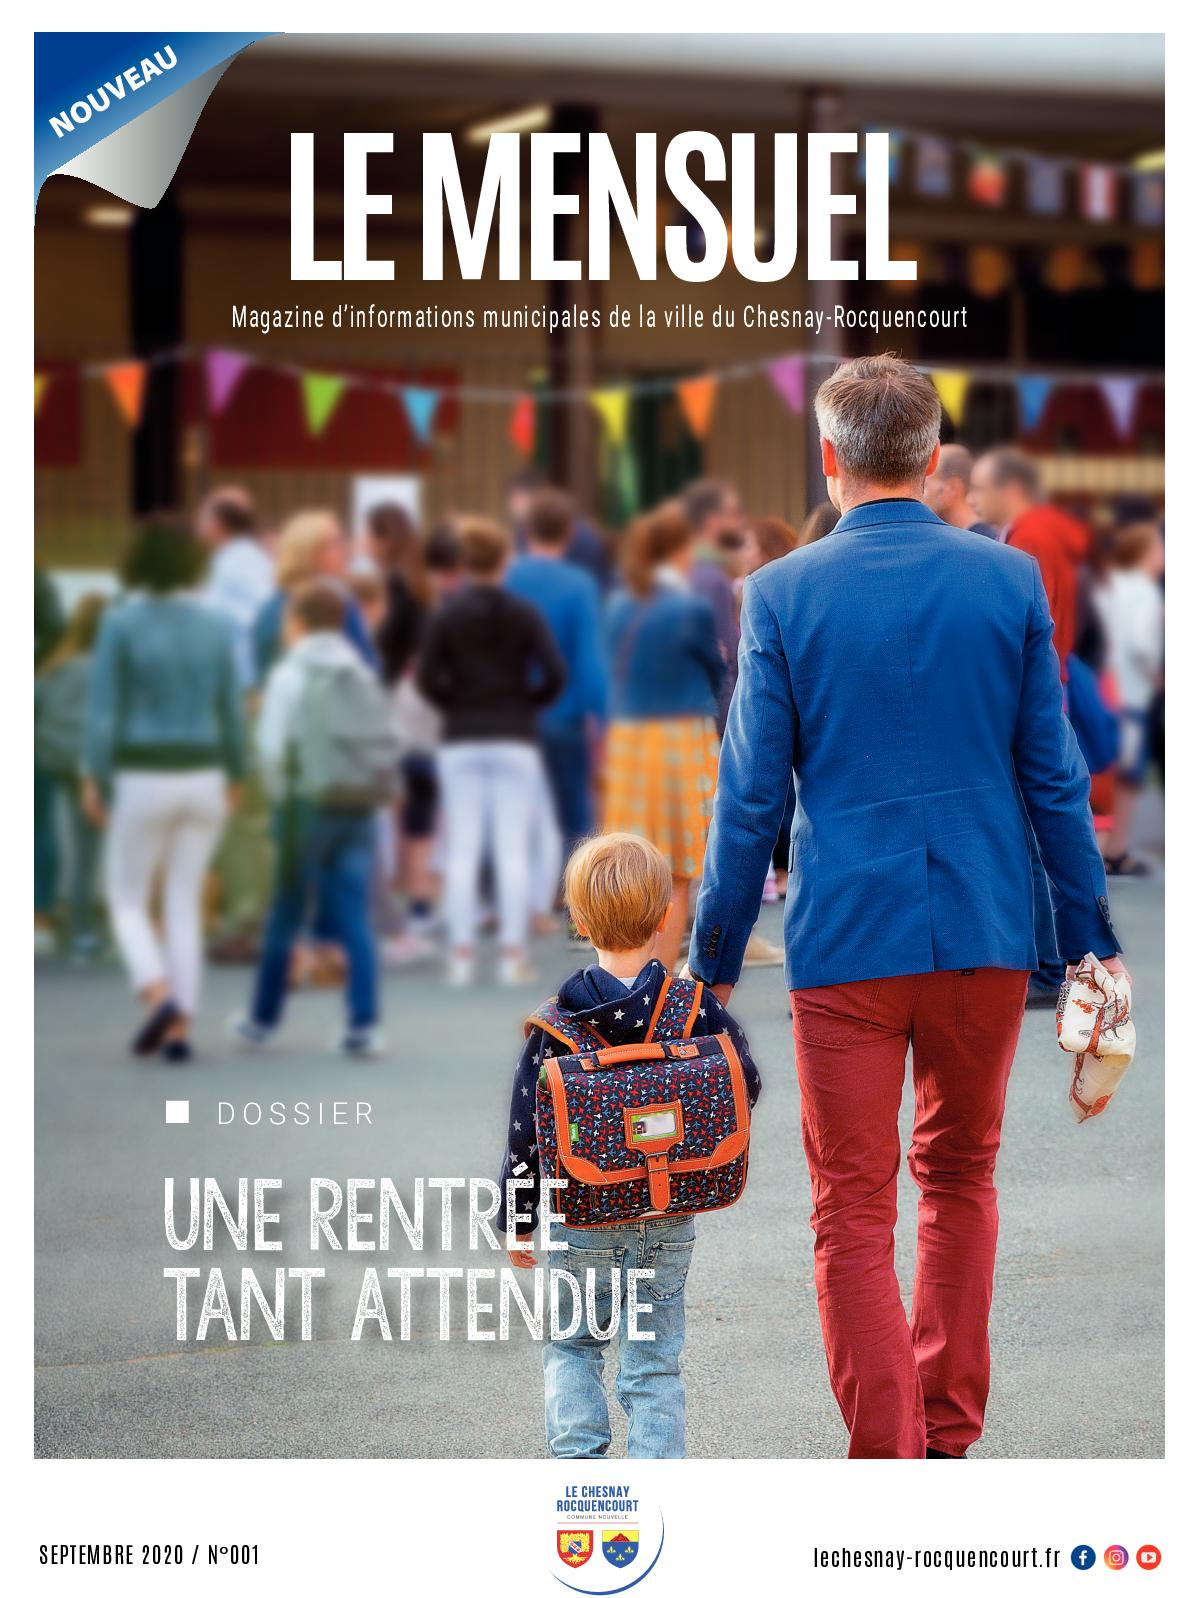 rencontre gay maroc à Le Chesnay-Rocquencourt